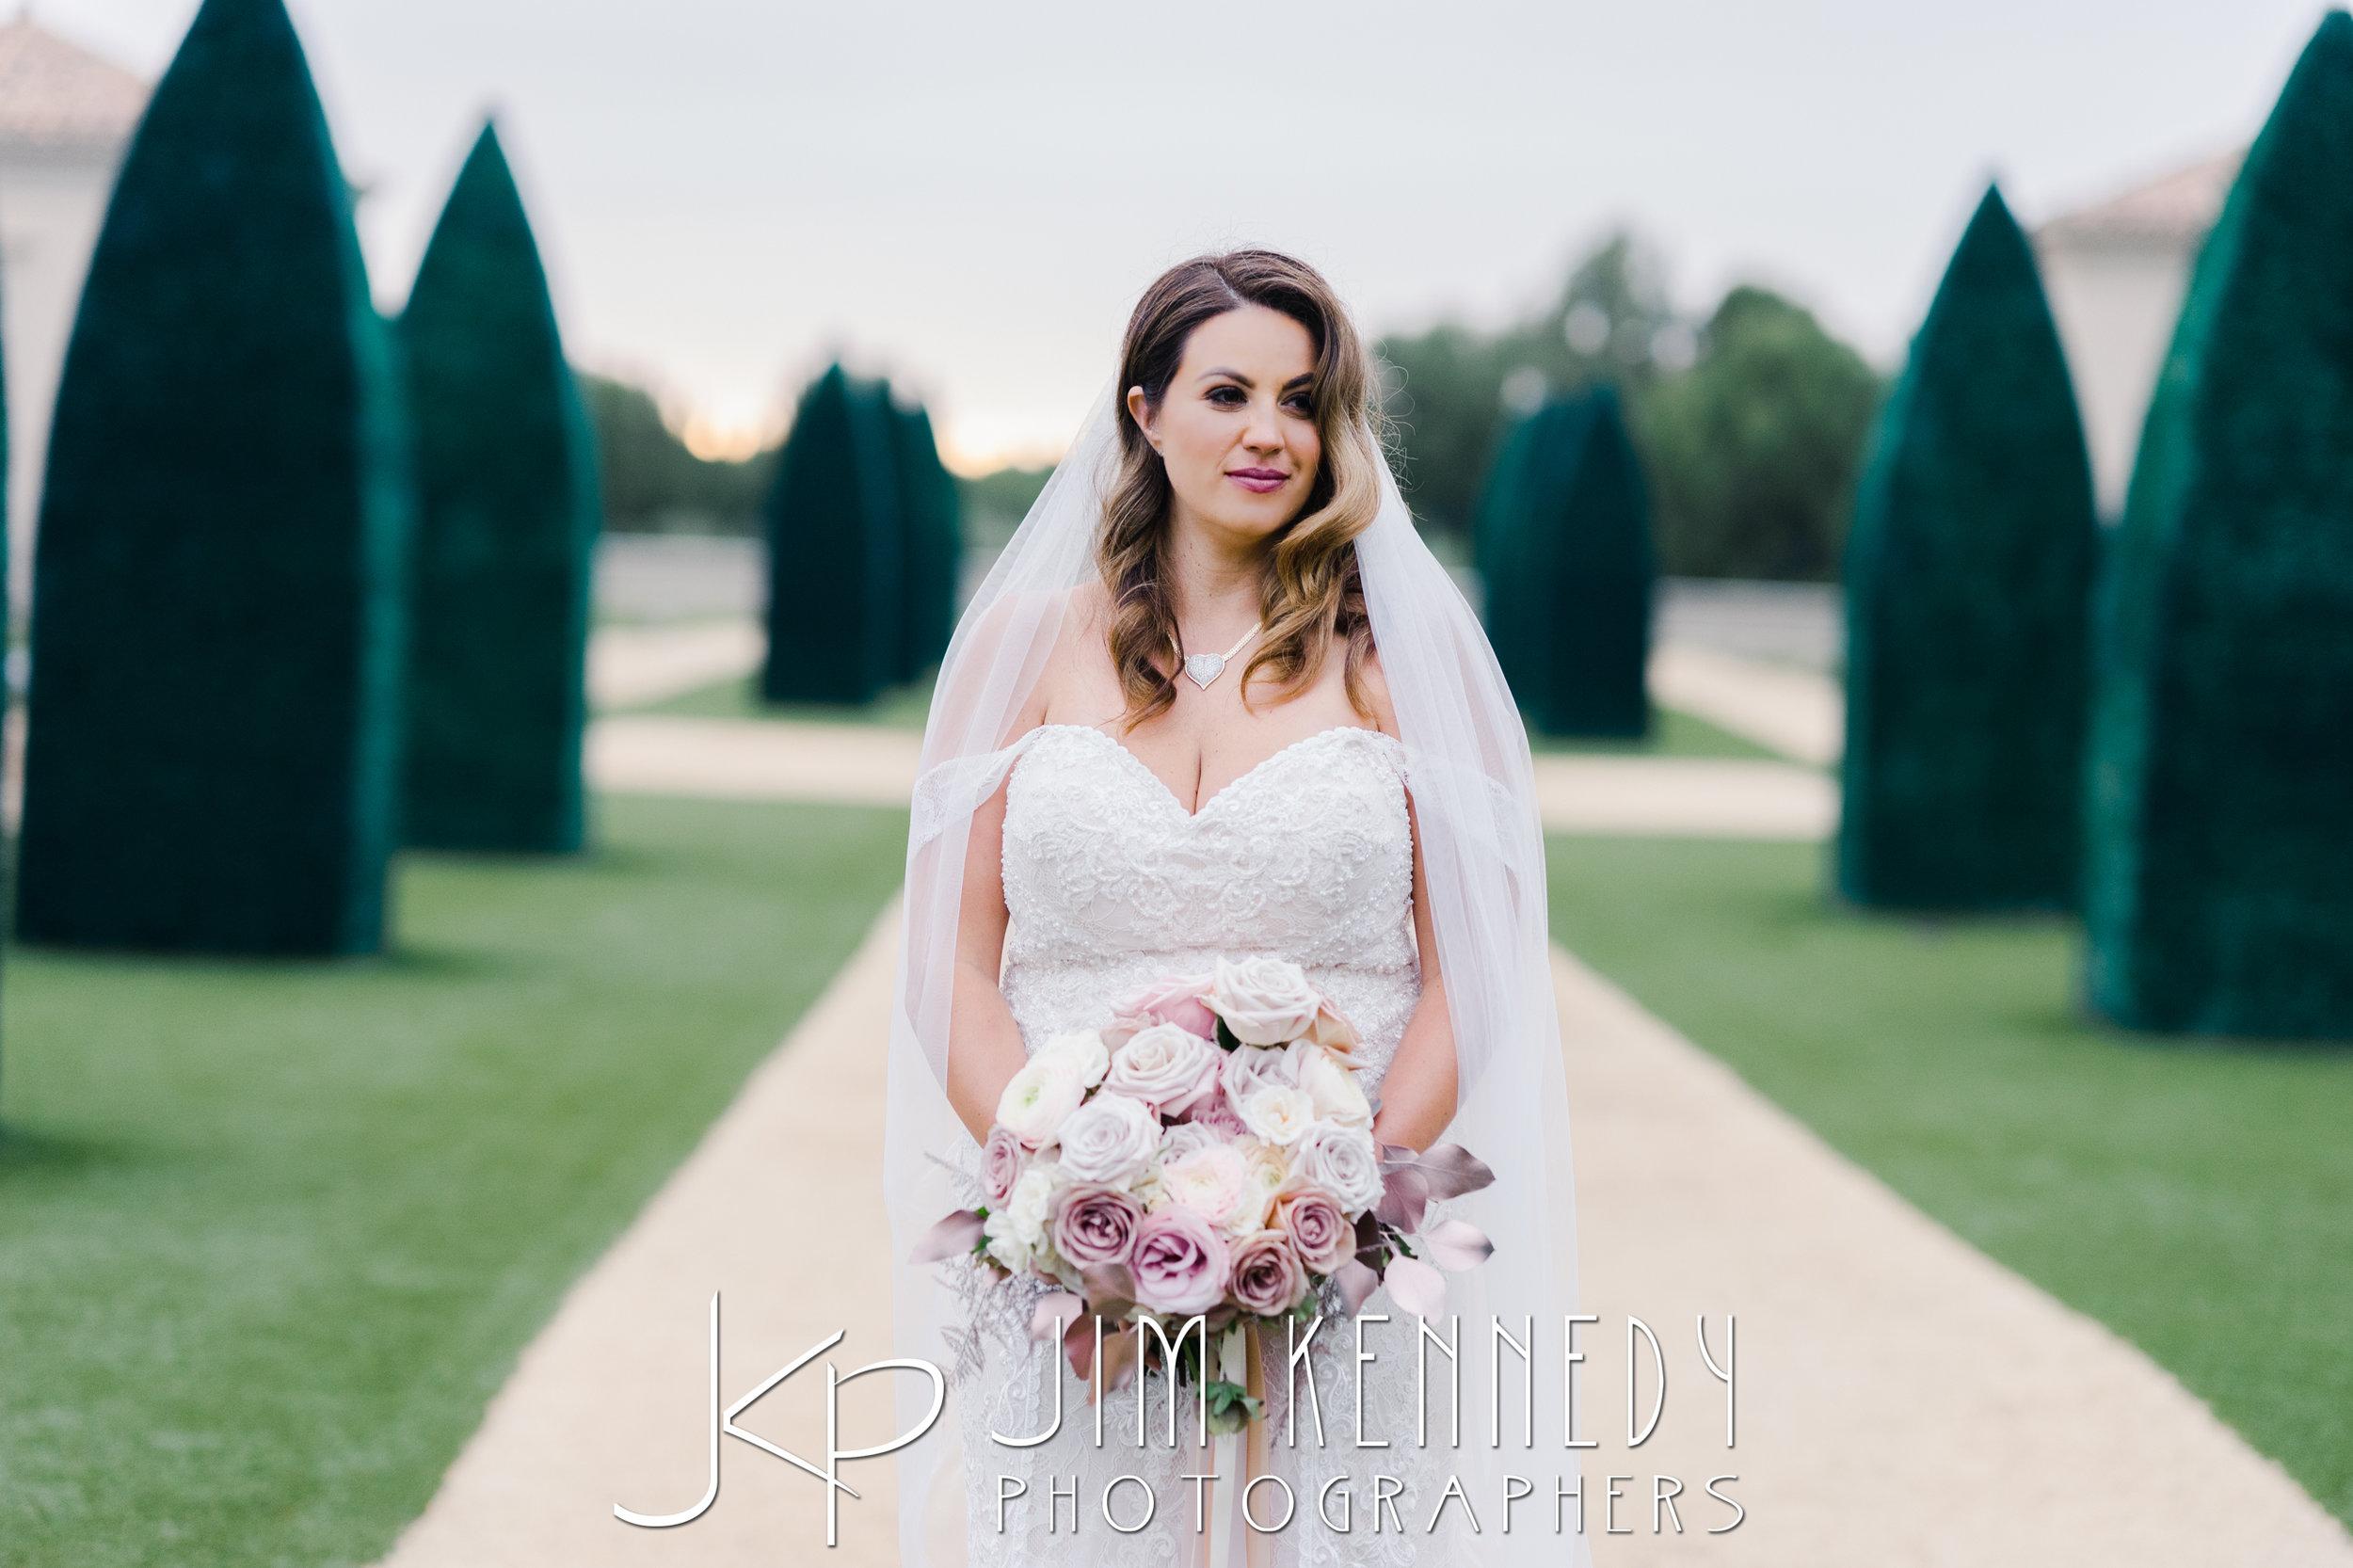 pelican-hill-wedding-jim-kenedy-photographers_0174.JPG